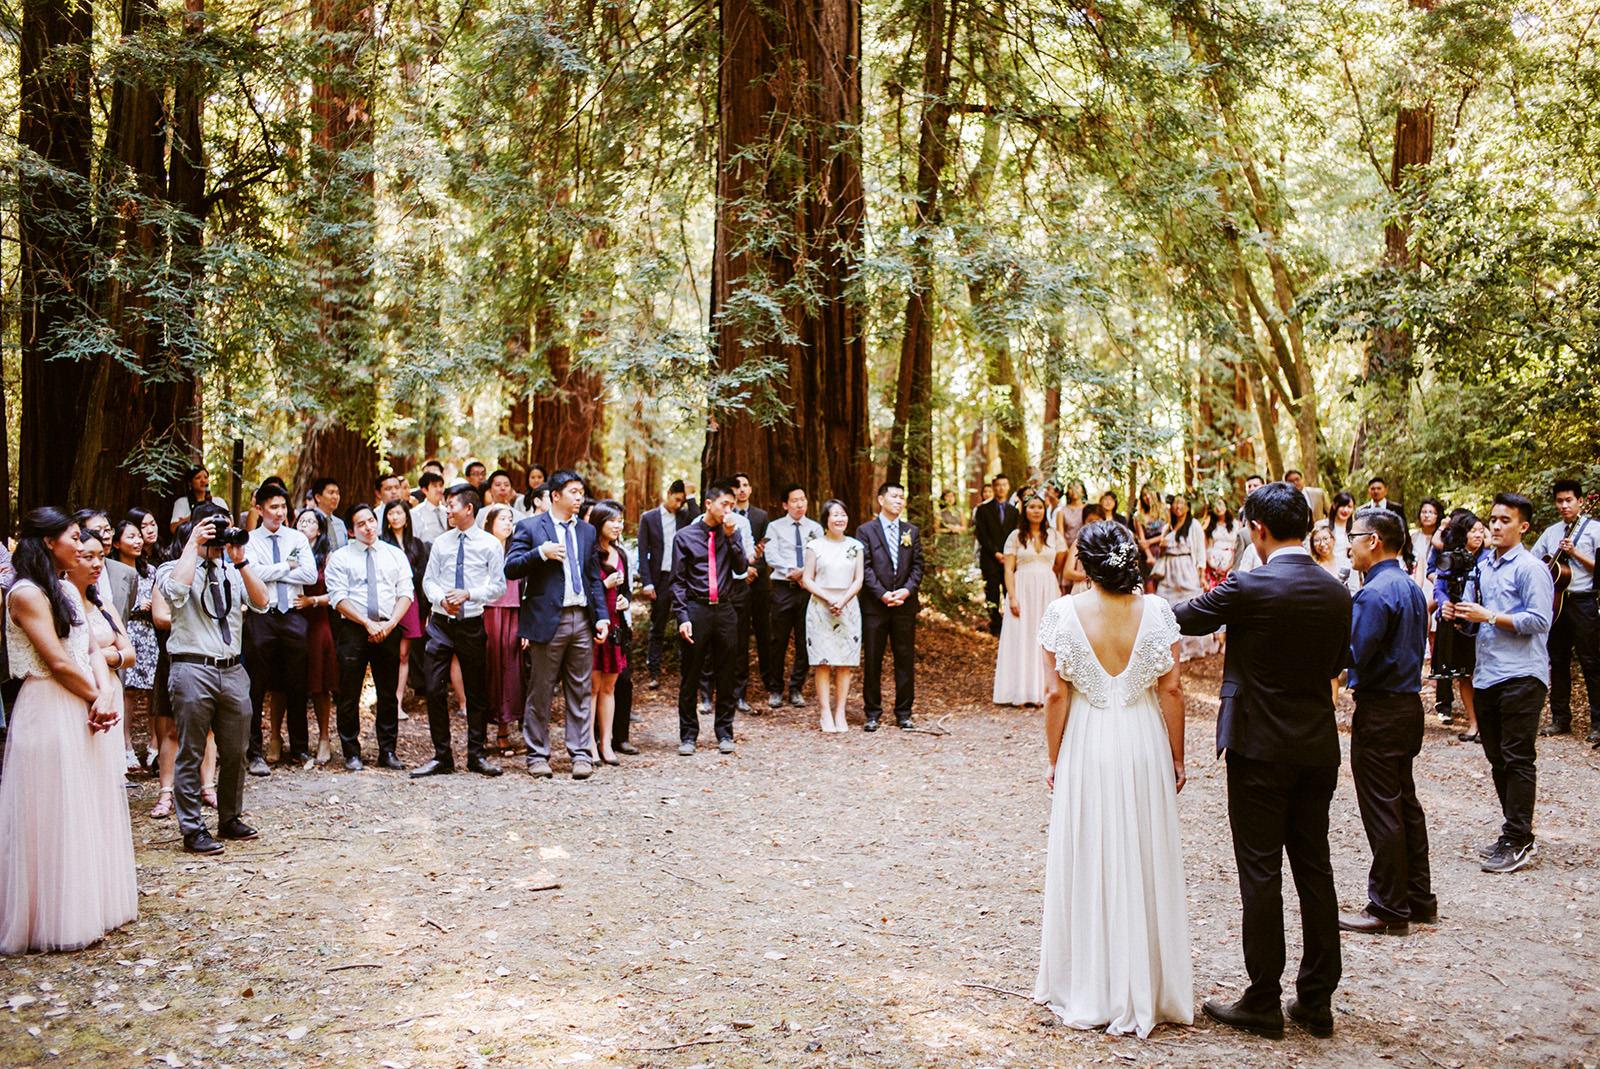 kimclay-blog-075 REDWOOD FOREST WEDDING